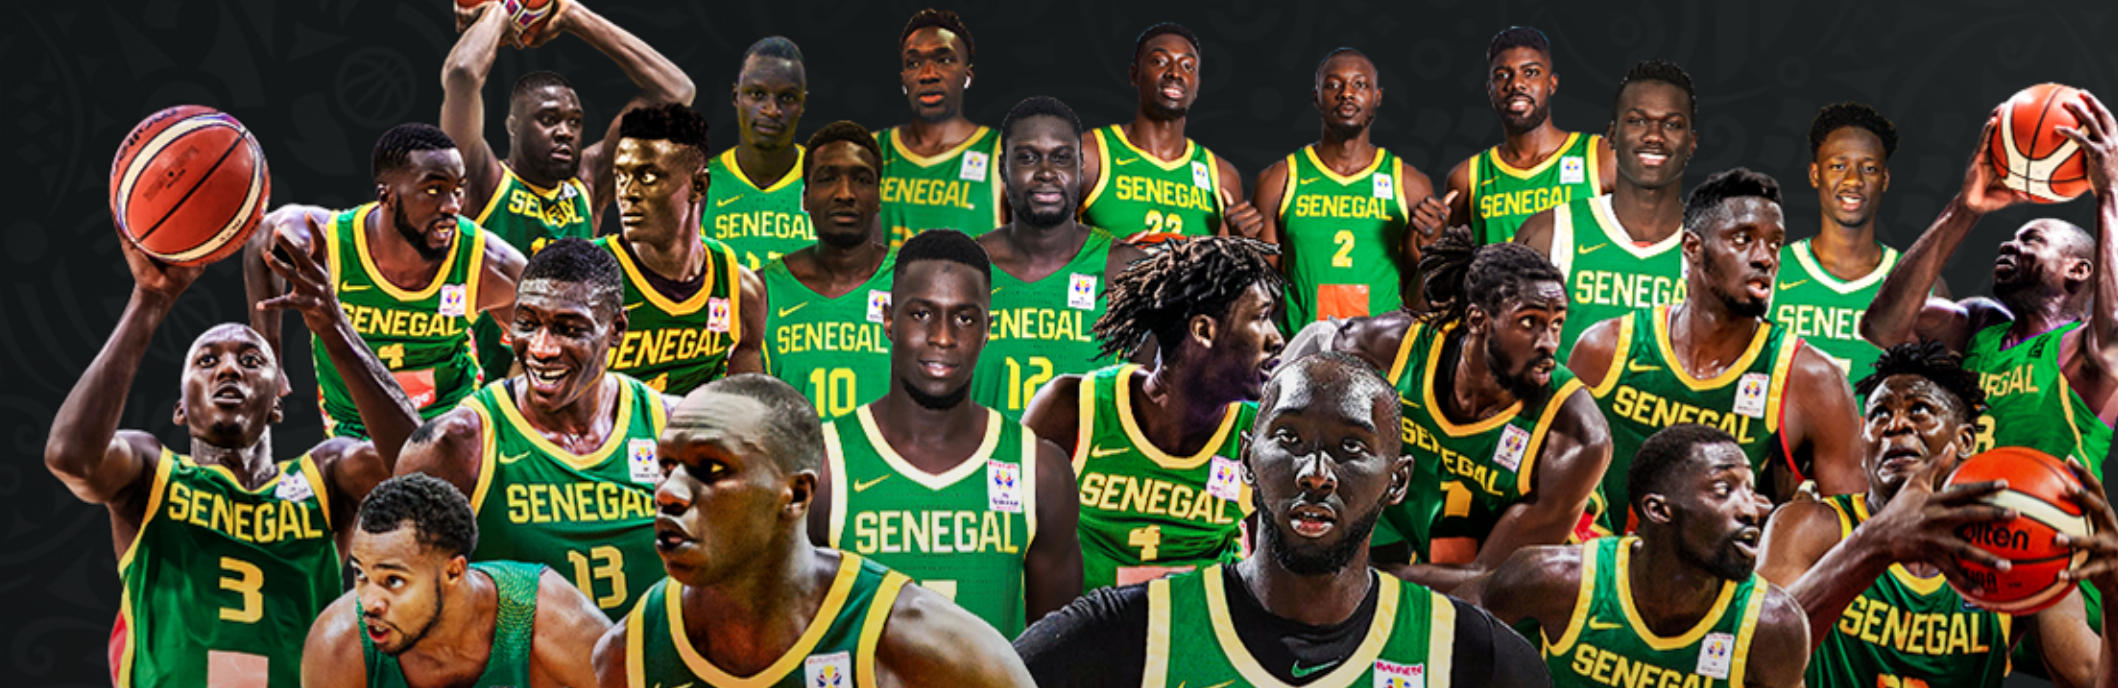 basketball world cup - photo #21